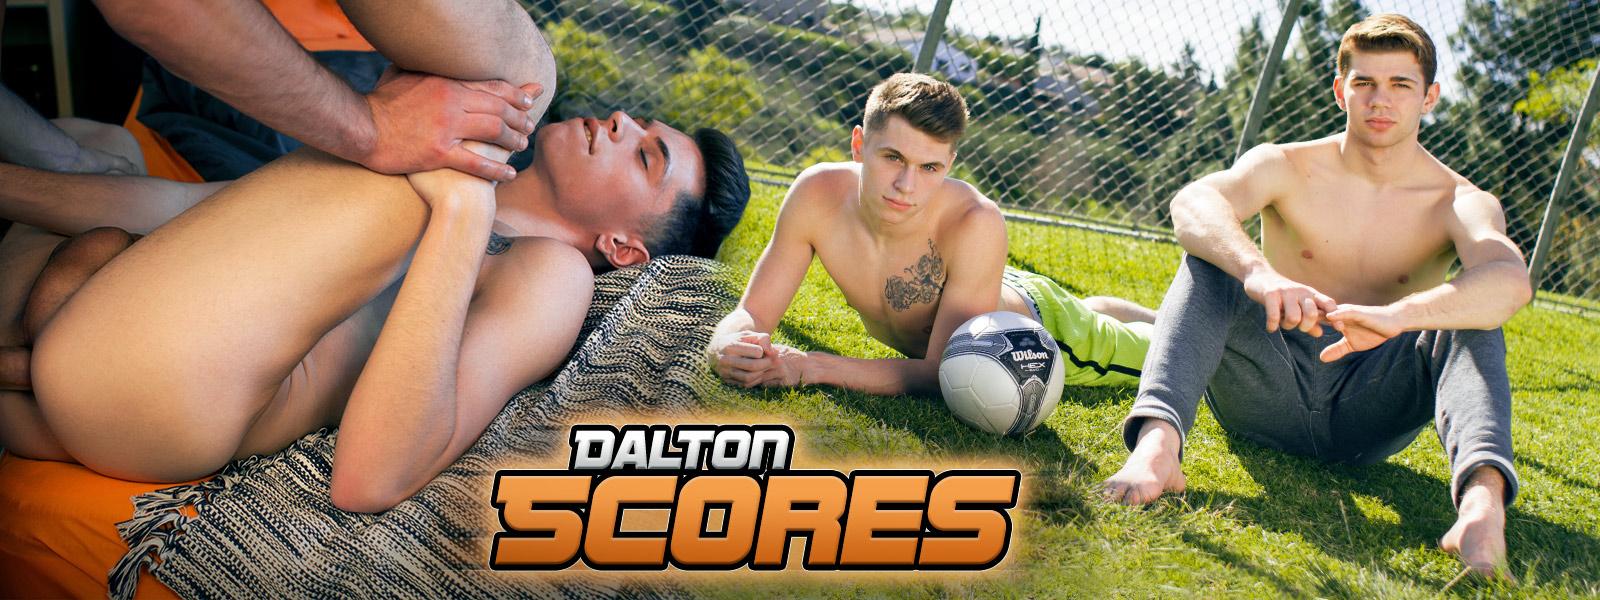 Dalton Scores